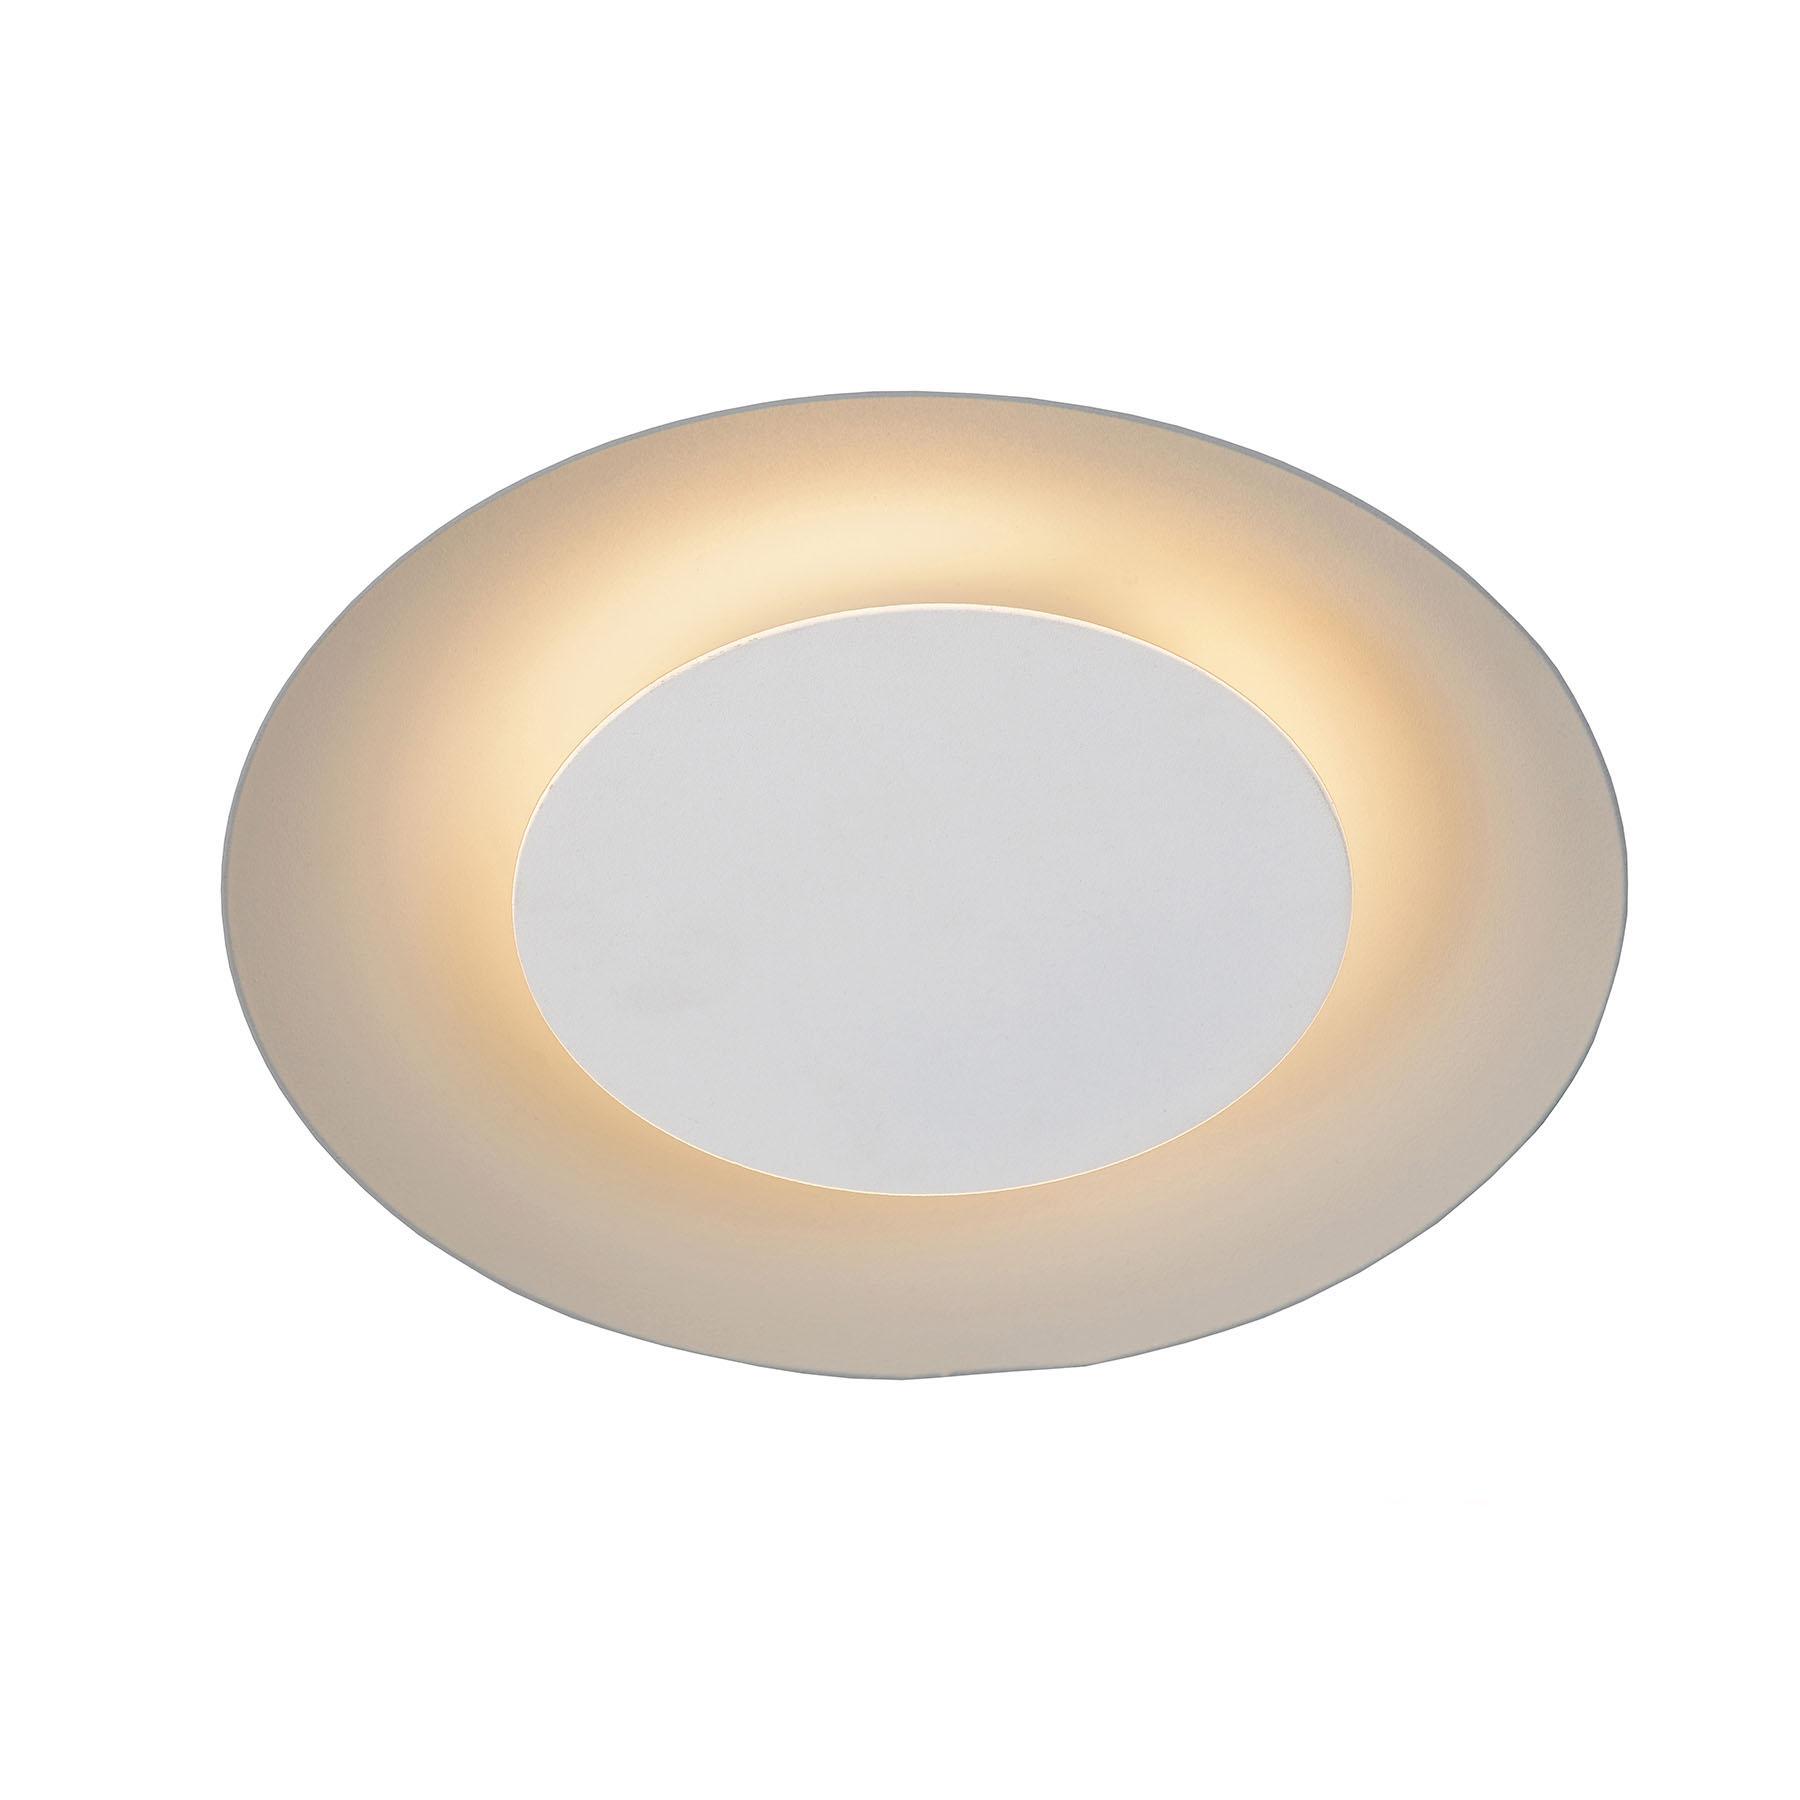 Lampa sufitowa LED Foskal biała, Ø 21,5 cm